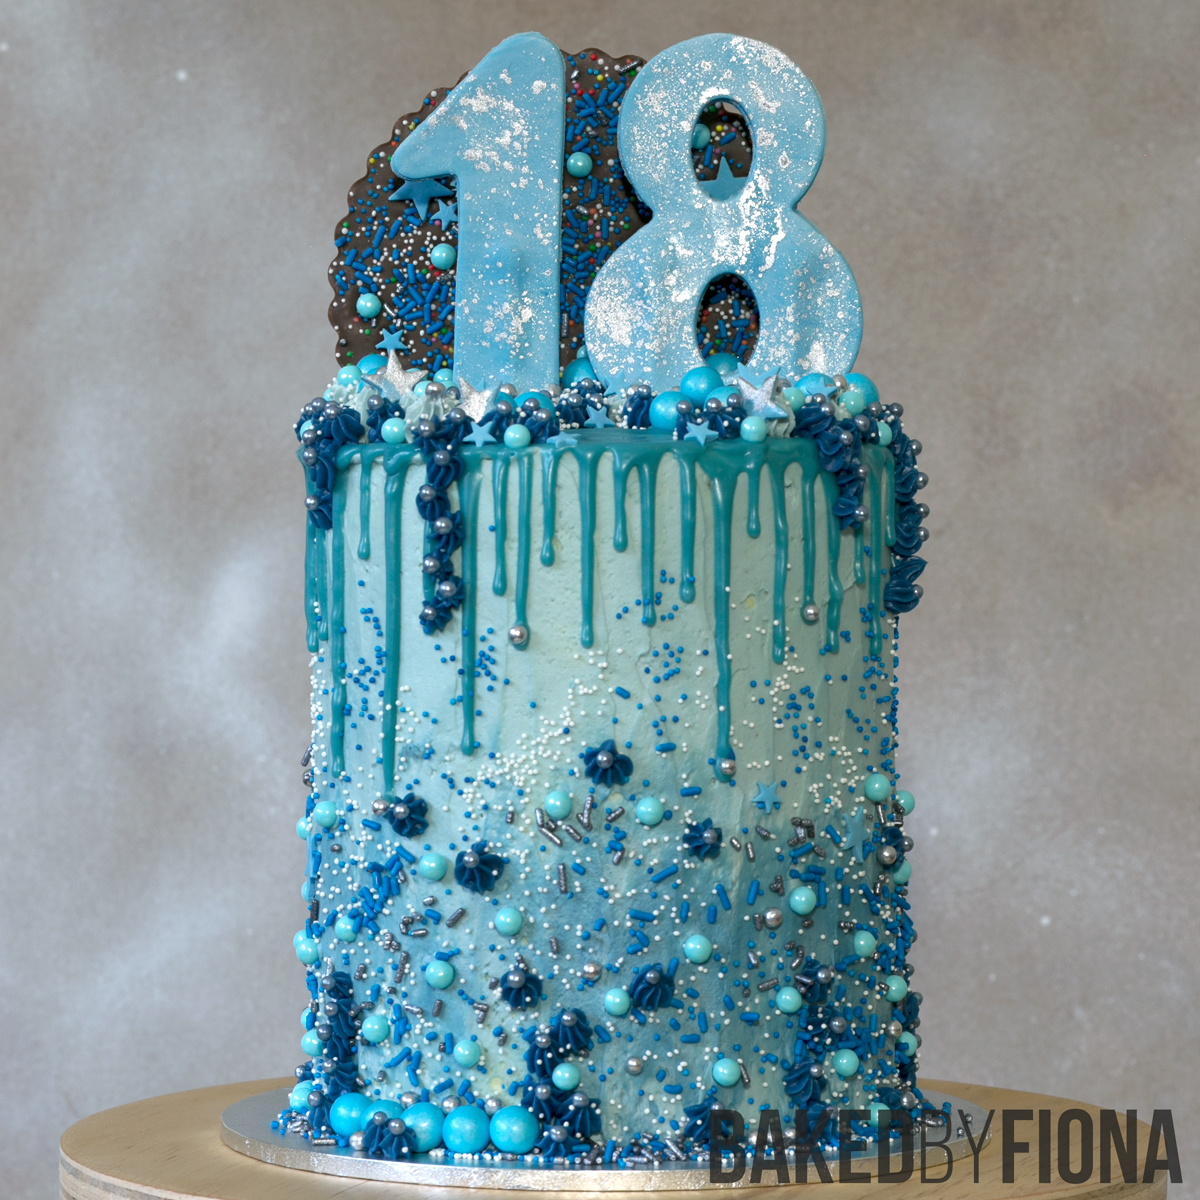 Sydney Cakes, Baked by Fiona blue sparkle 18th birthday cake